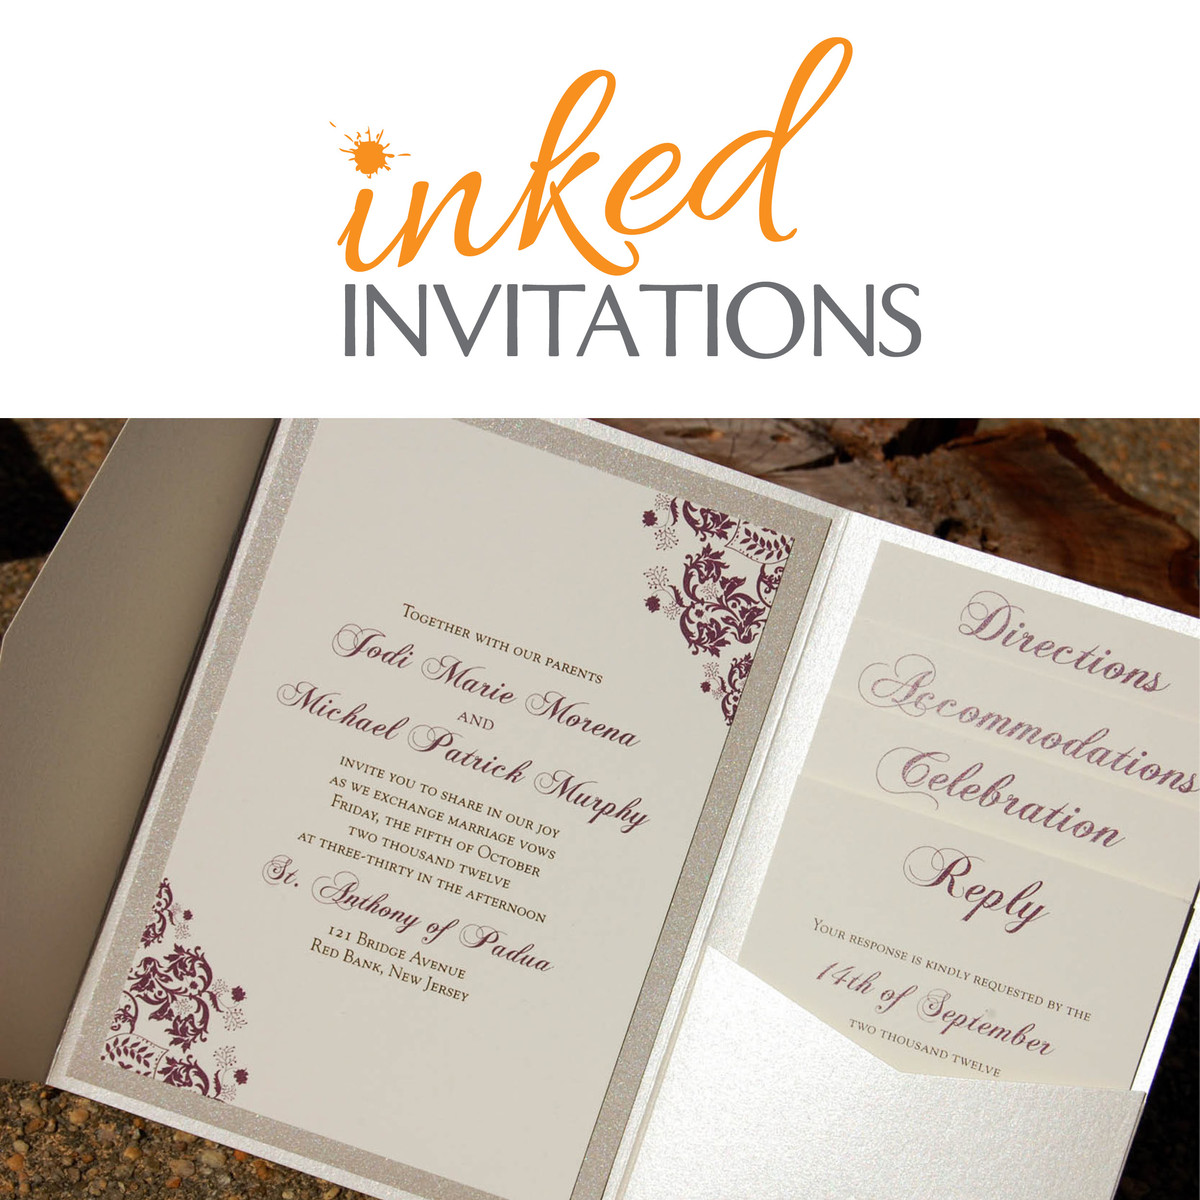 inked invitations invitations red bank nj weddingwire With wedding invitations red bank nj